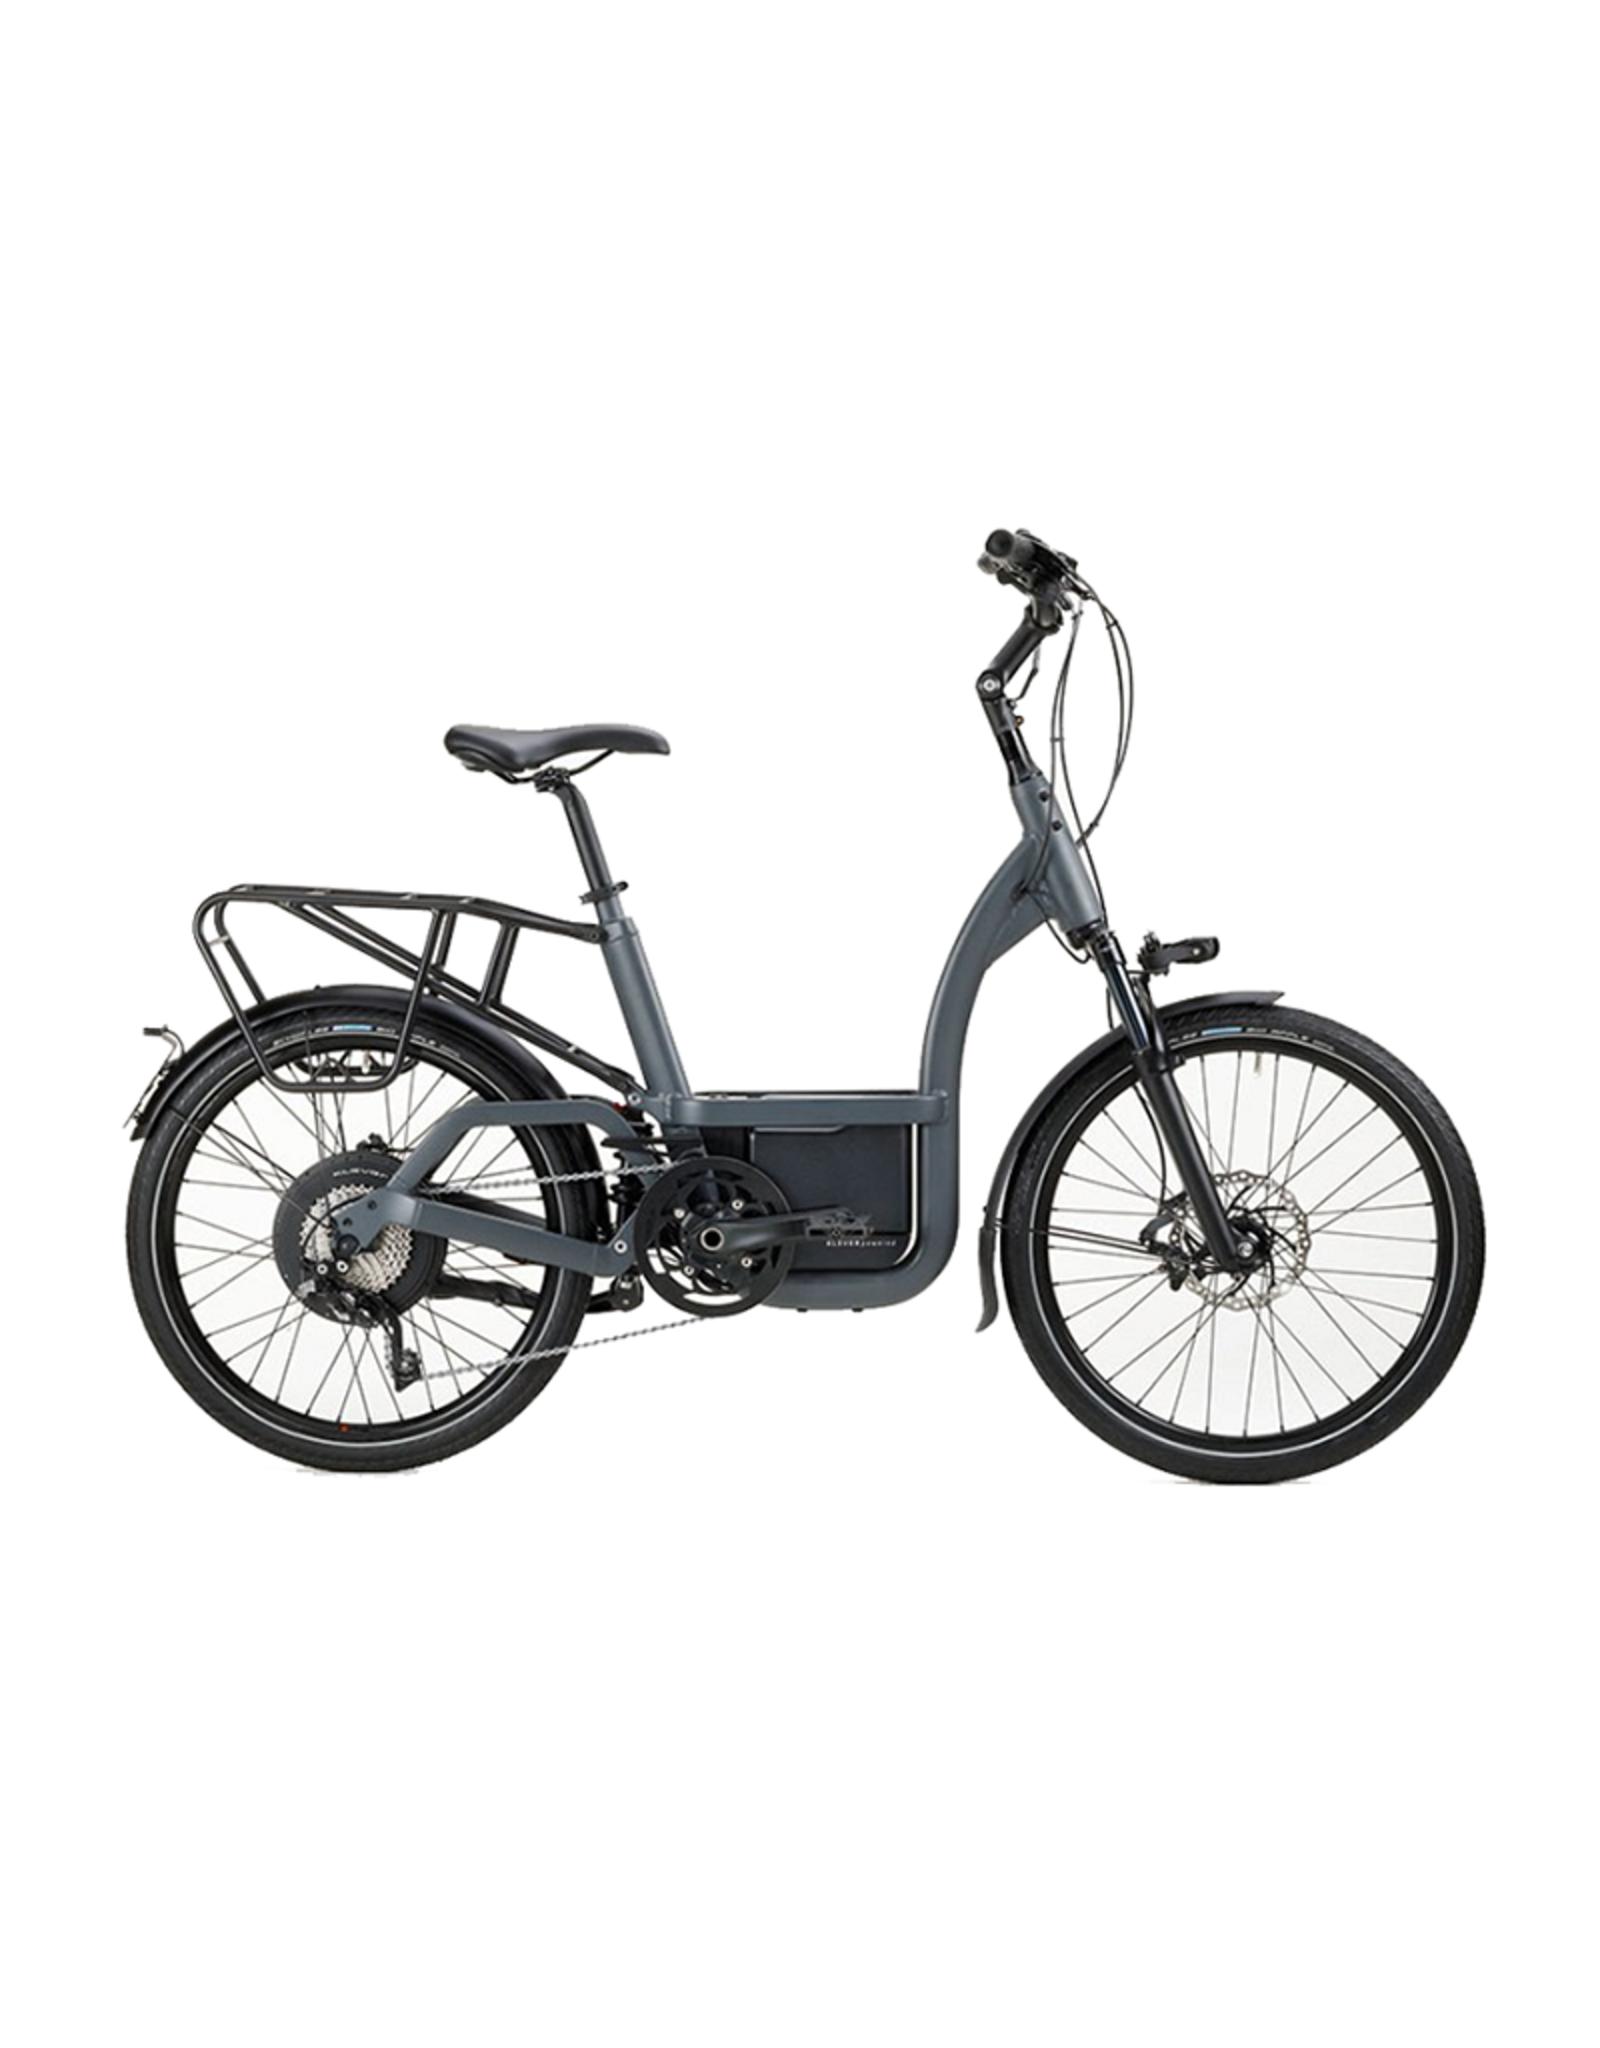 Klever B-Speed (Model 2019)